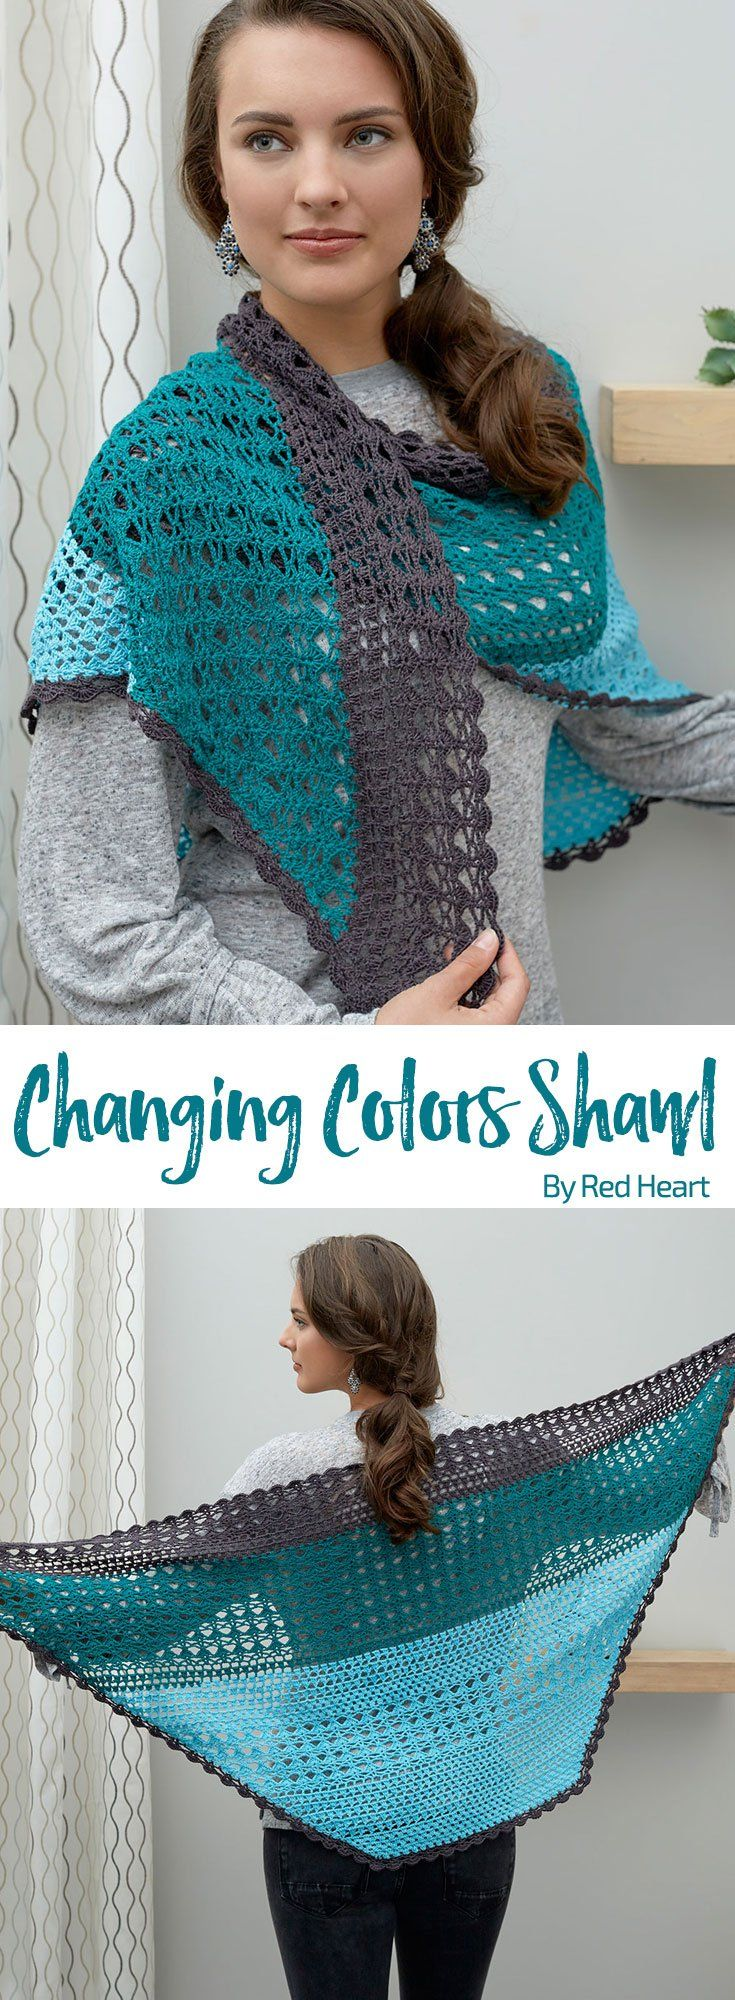 Changing Colors Shawl free crochet pattern in It's a Wrap yarn.